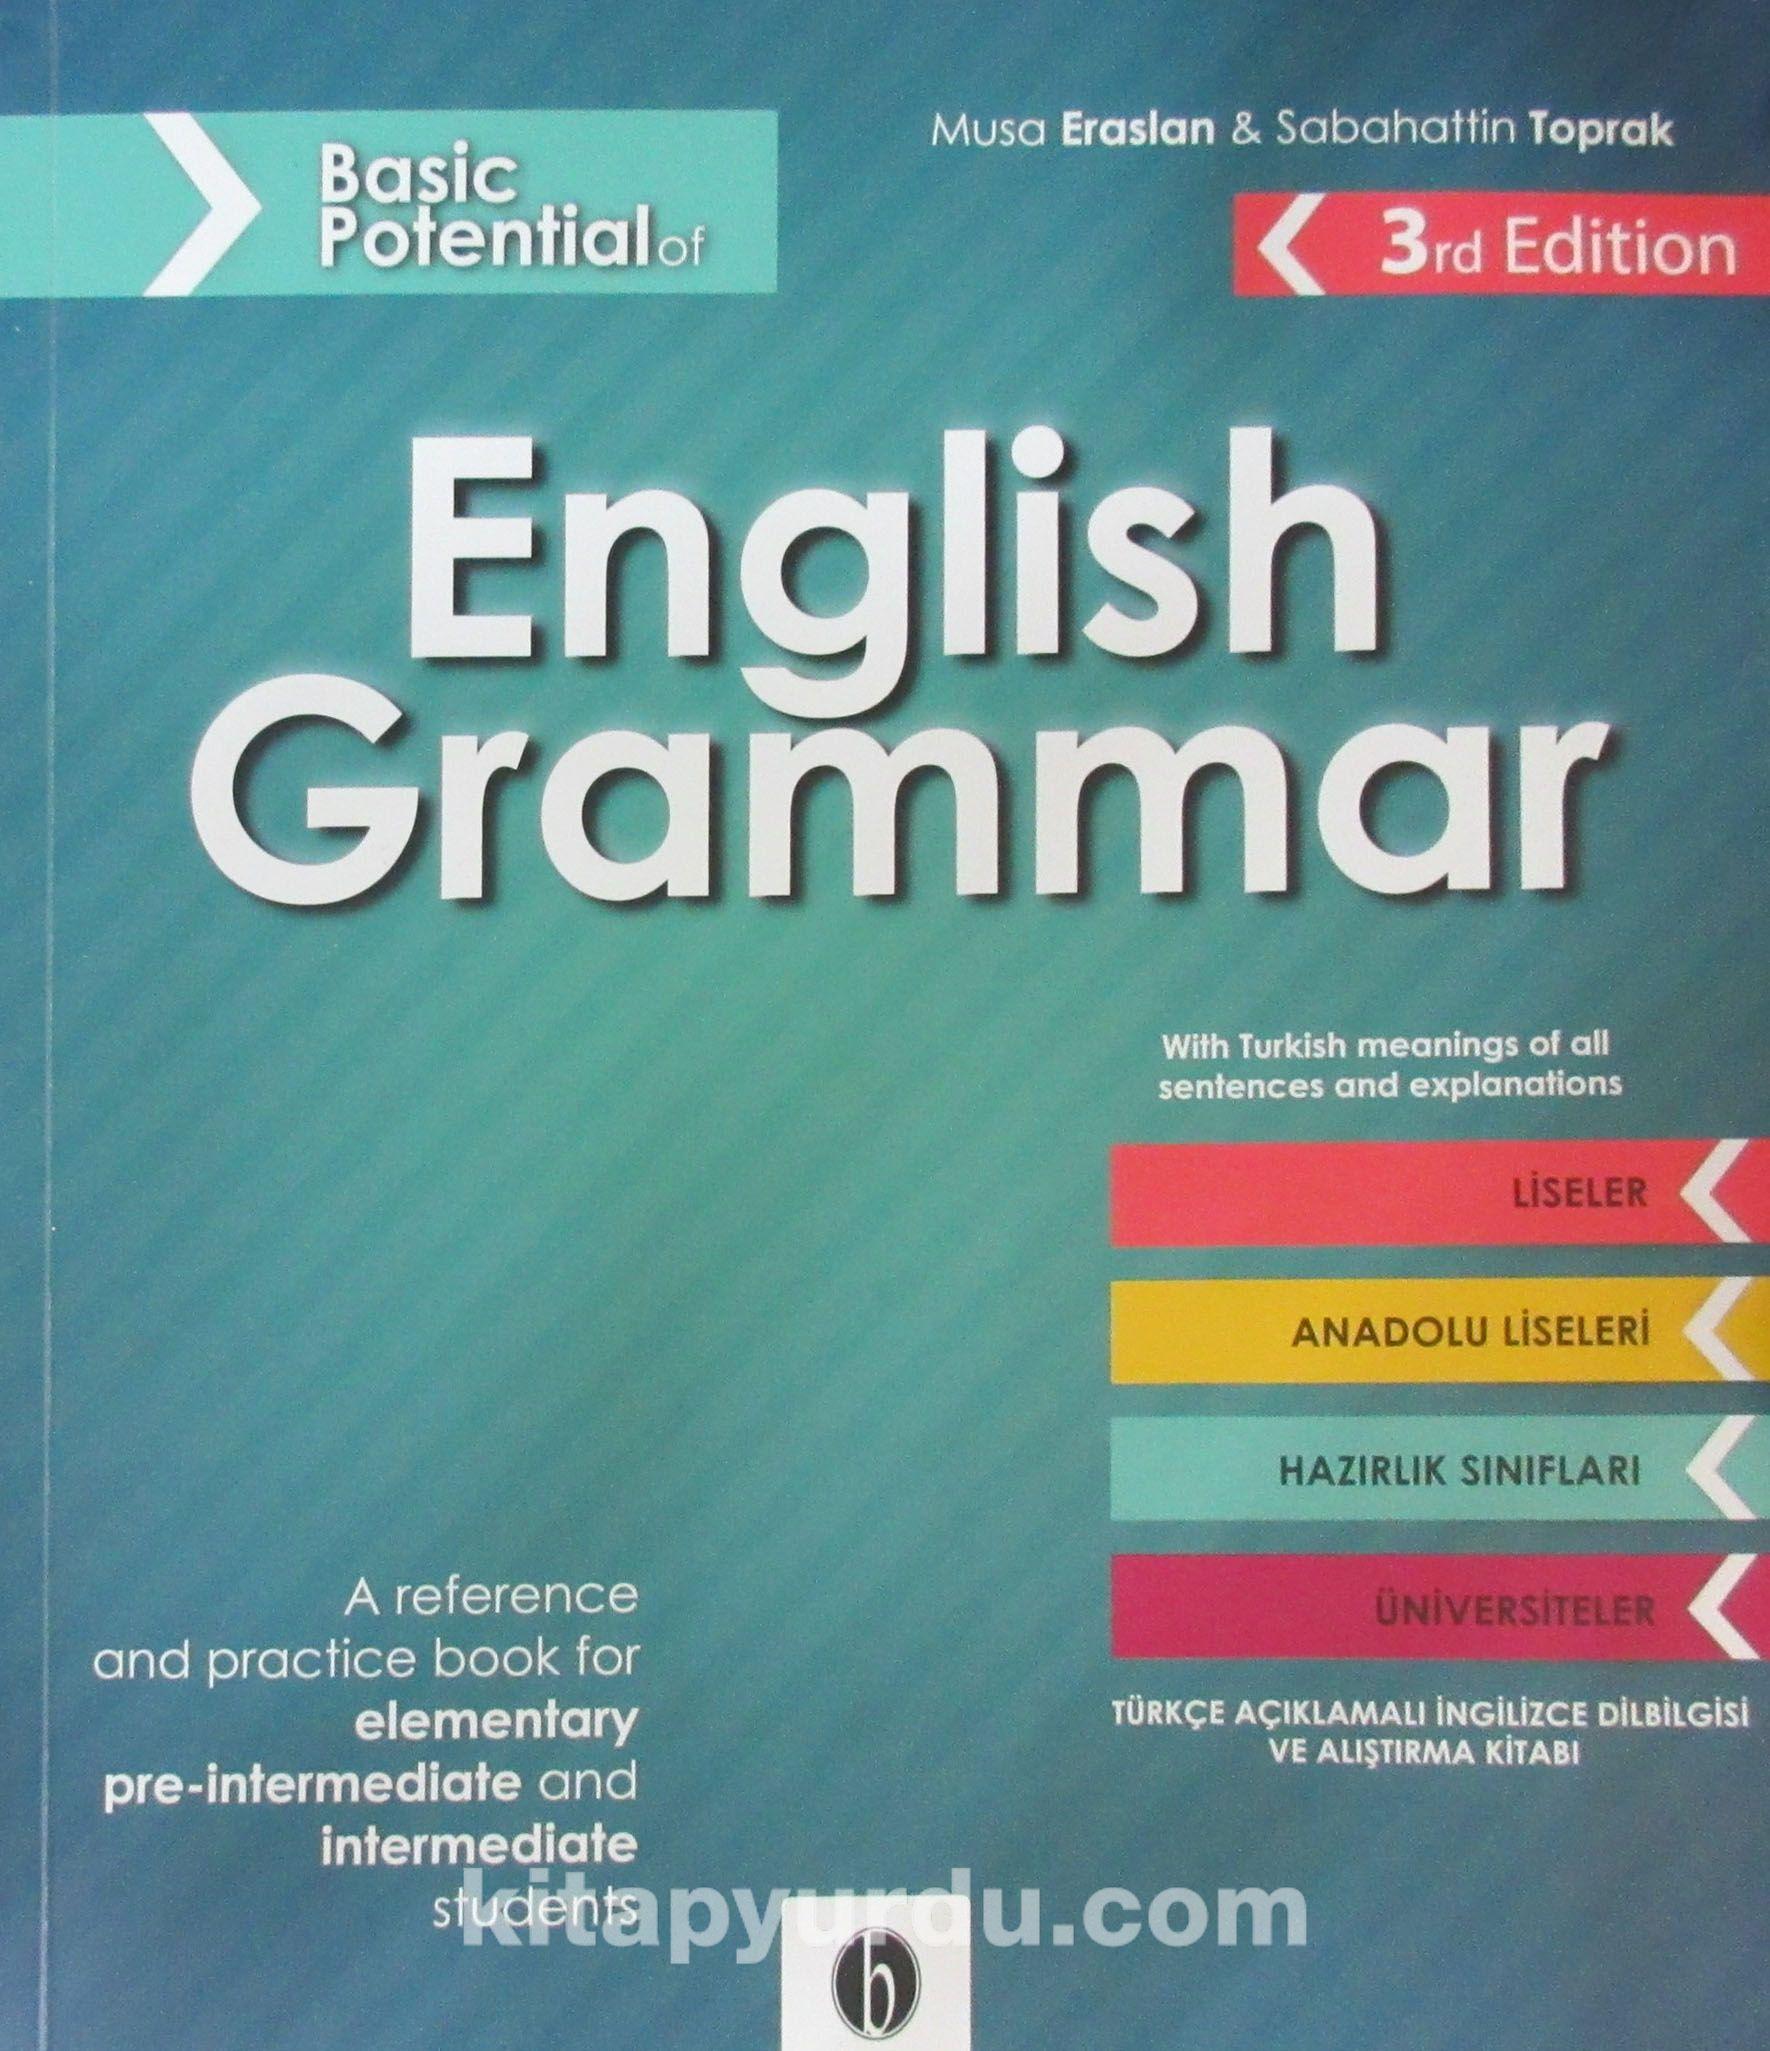 ingilizce gramer kitabı